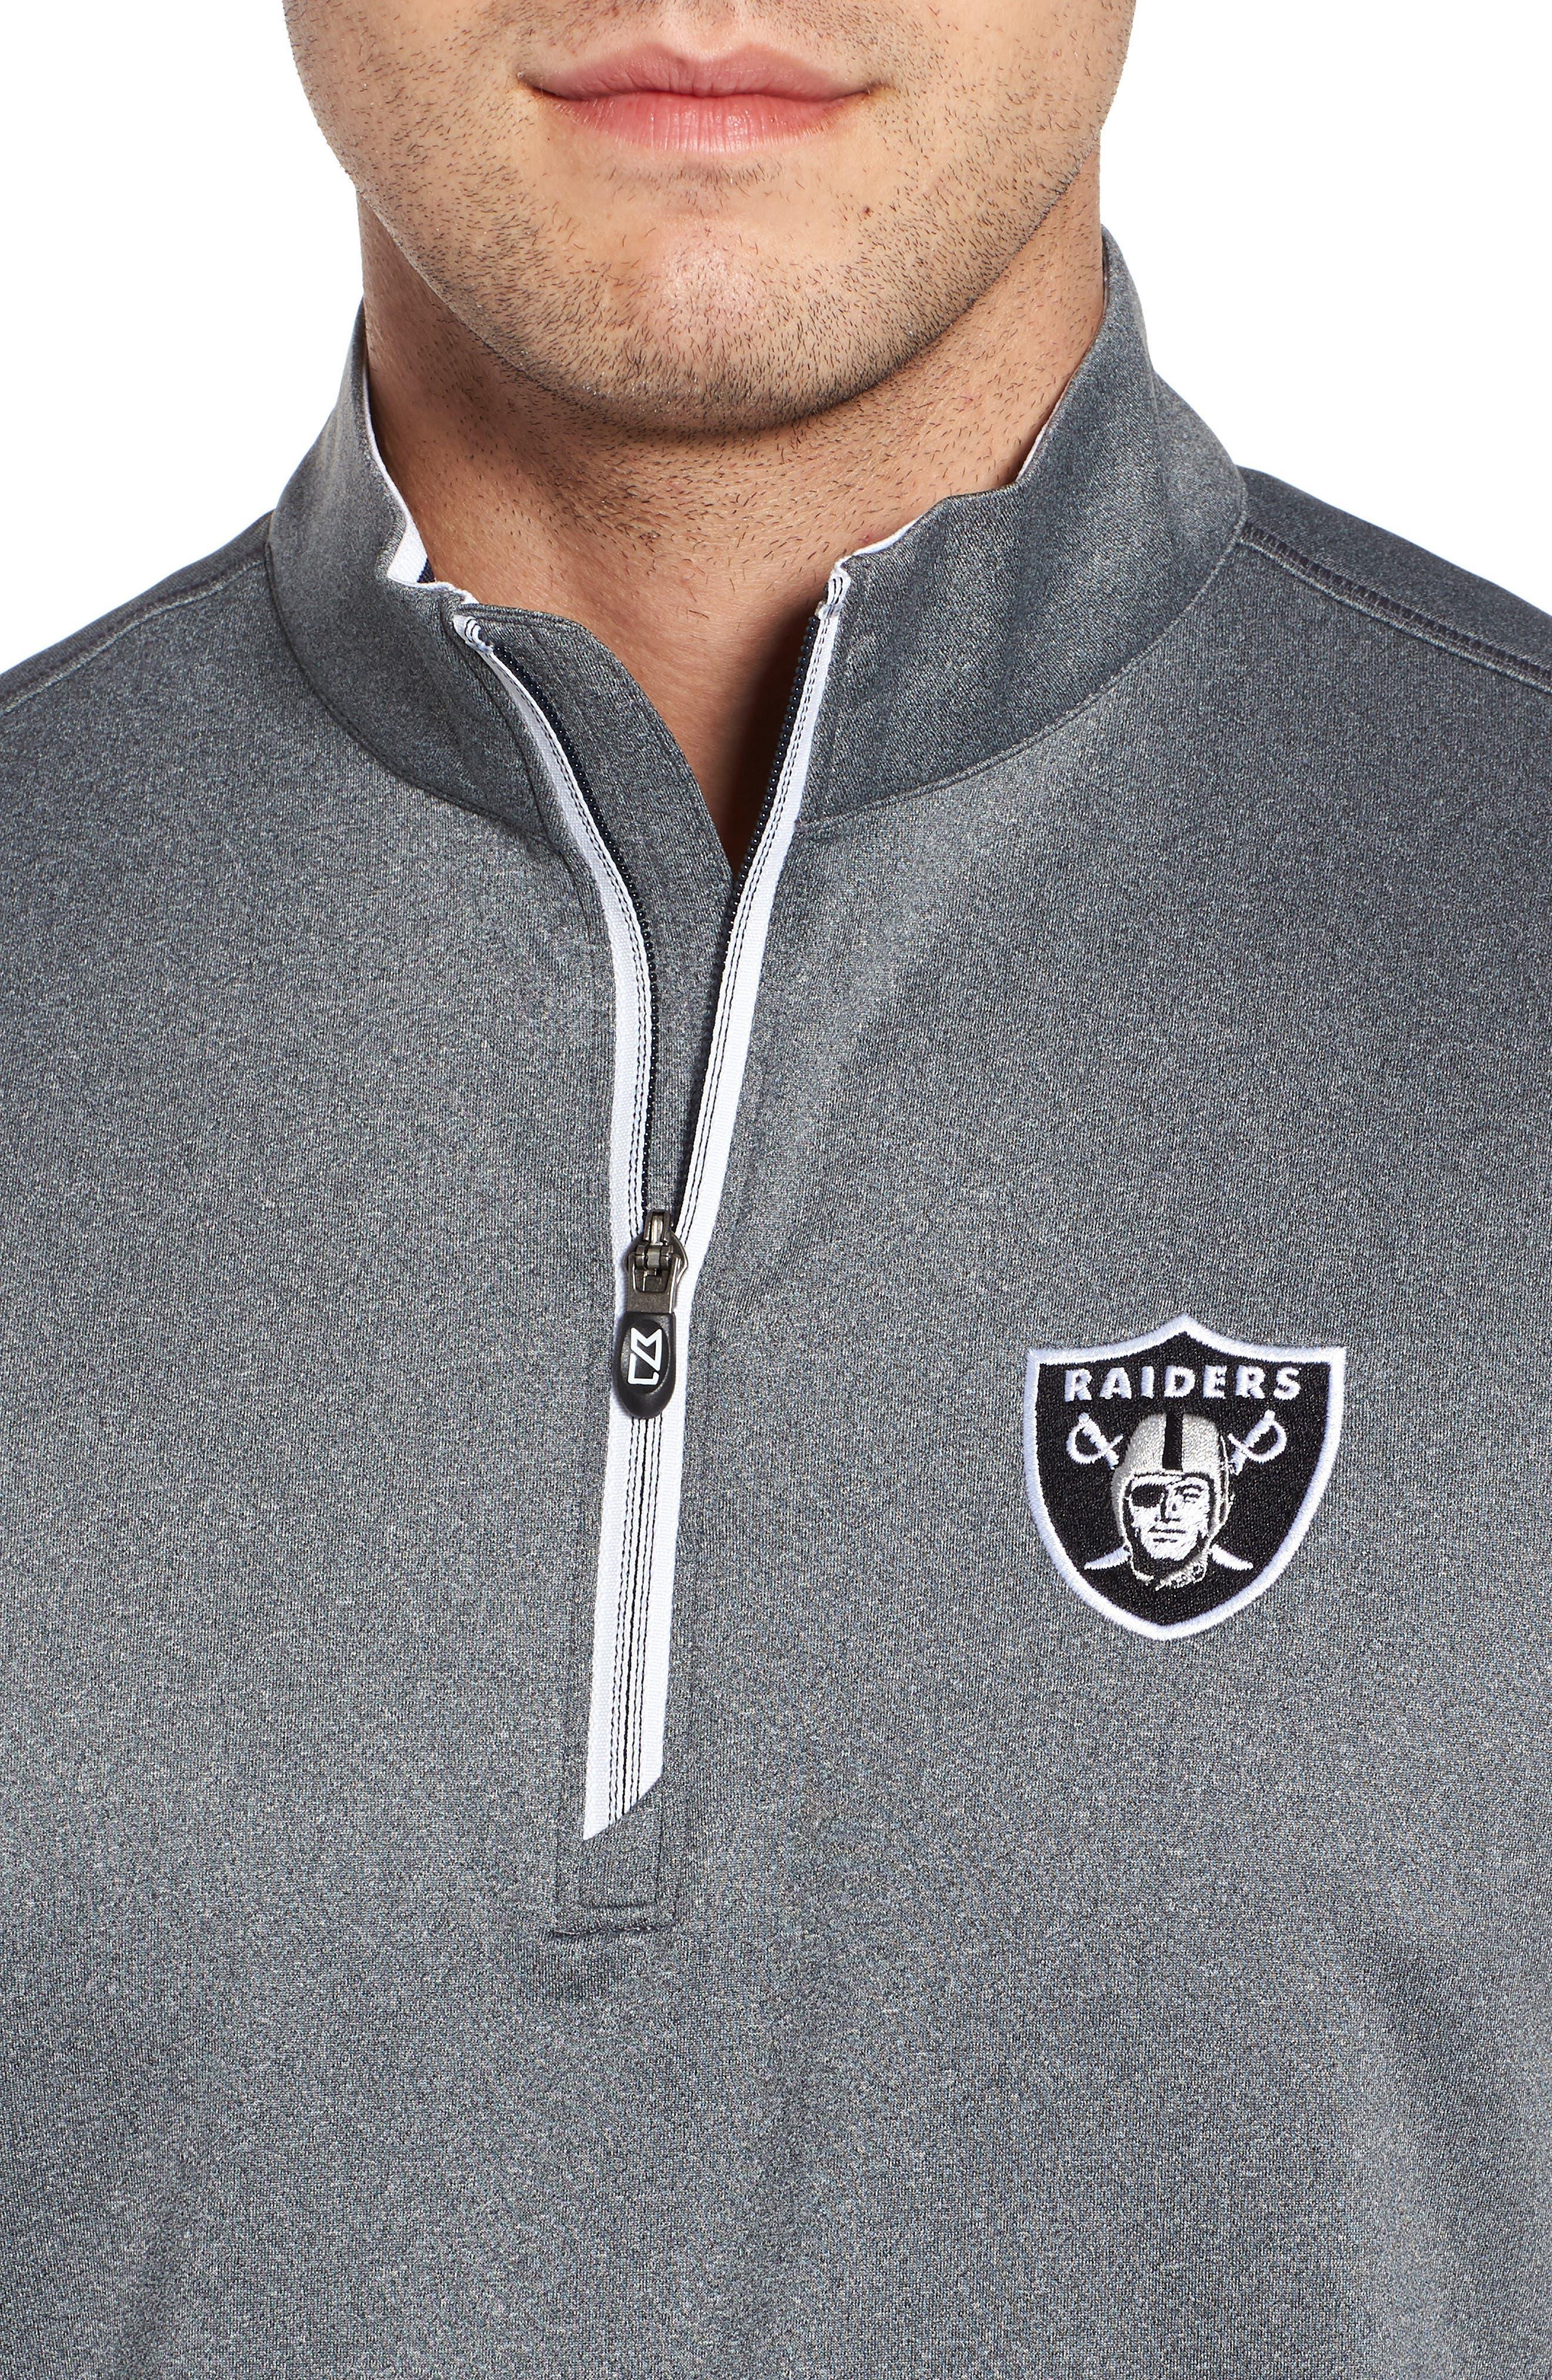 Endurance Oakland Raiders Regular Fit Pullover,                             Alternate thumbnail 4, color,                             CHARCOAL HEATHER